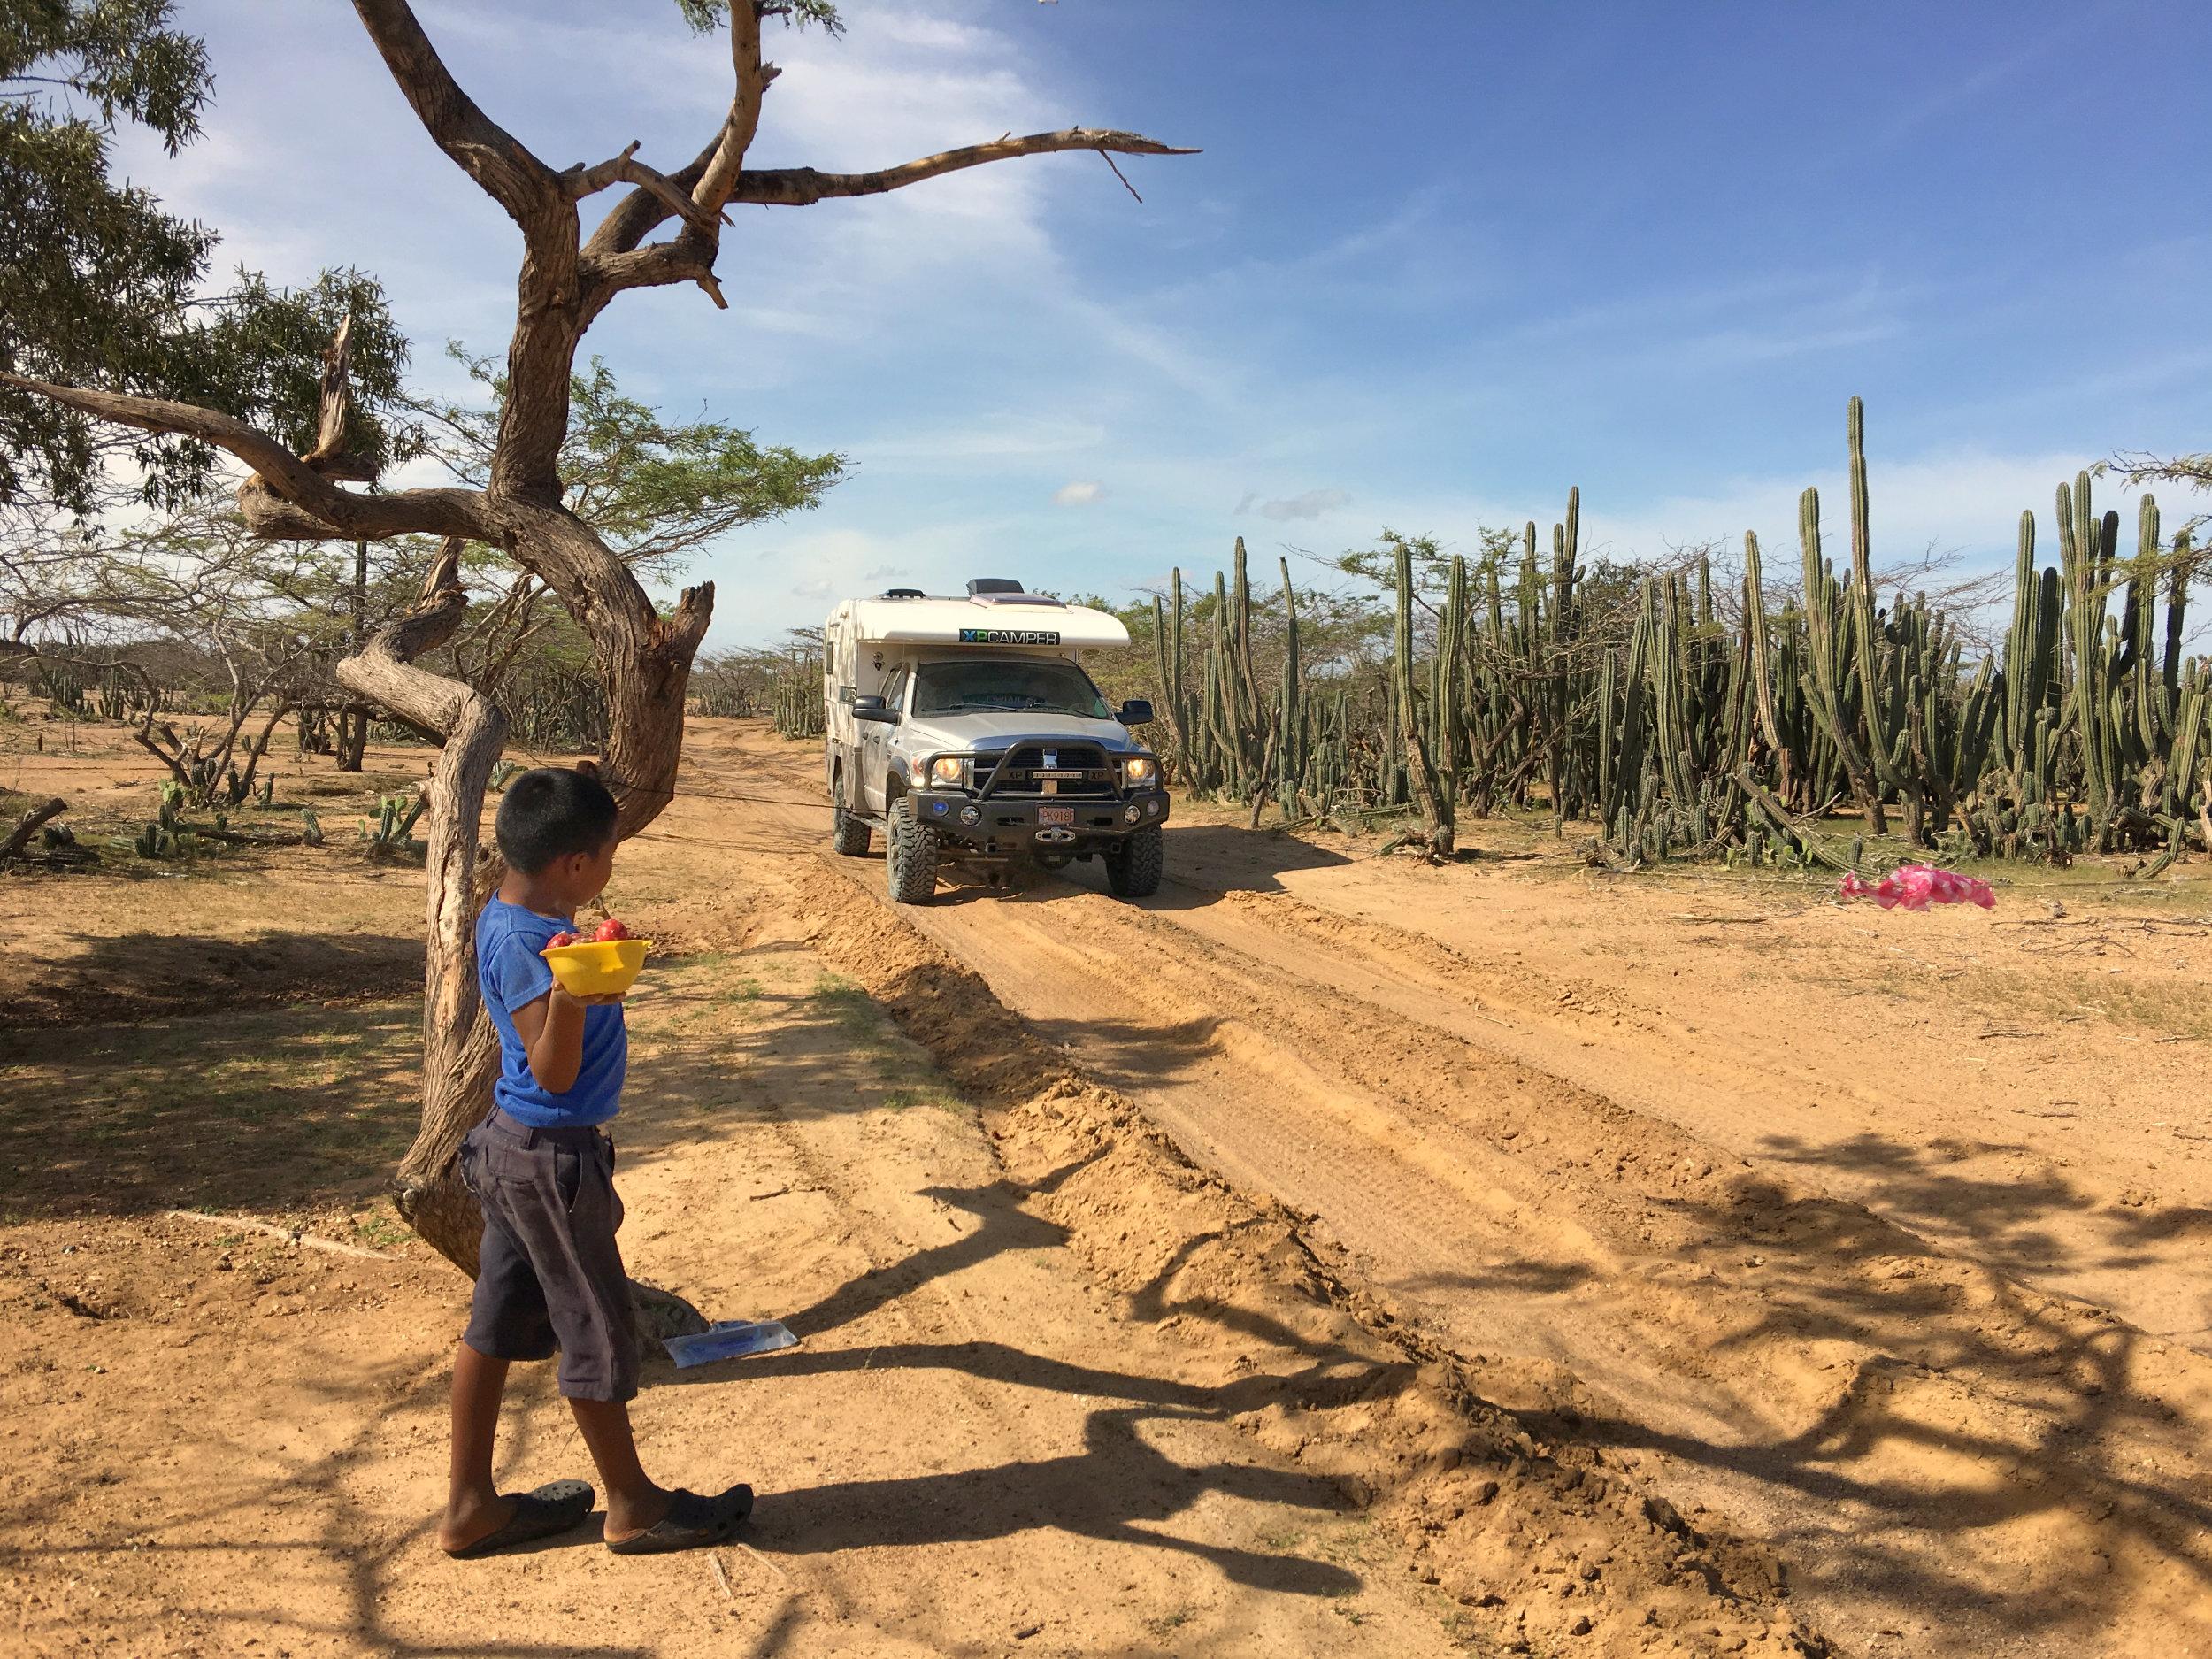 A child's roadblock in La Guijara